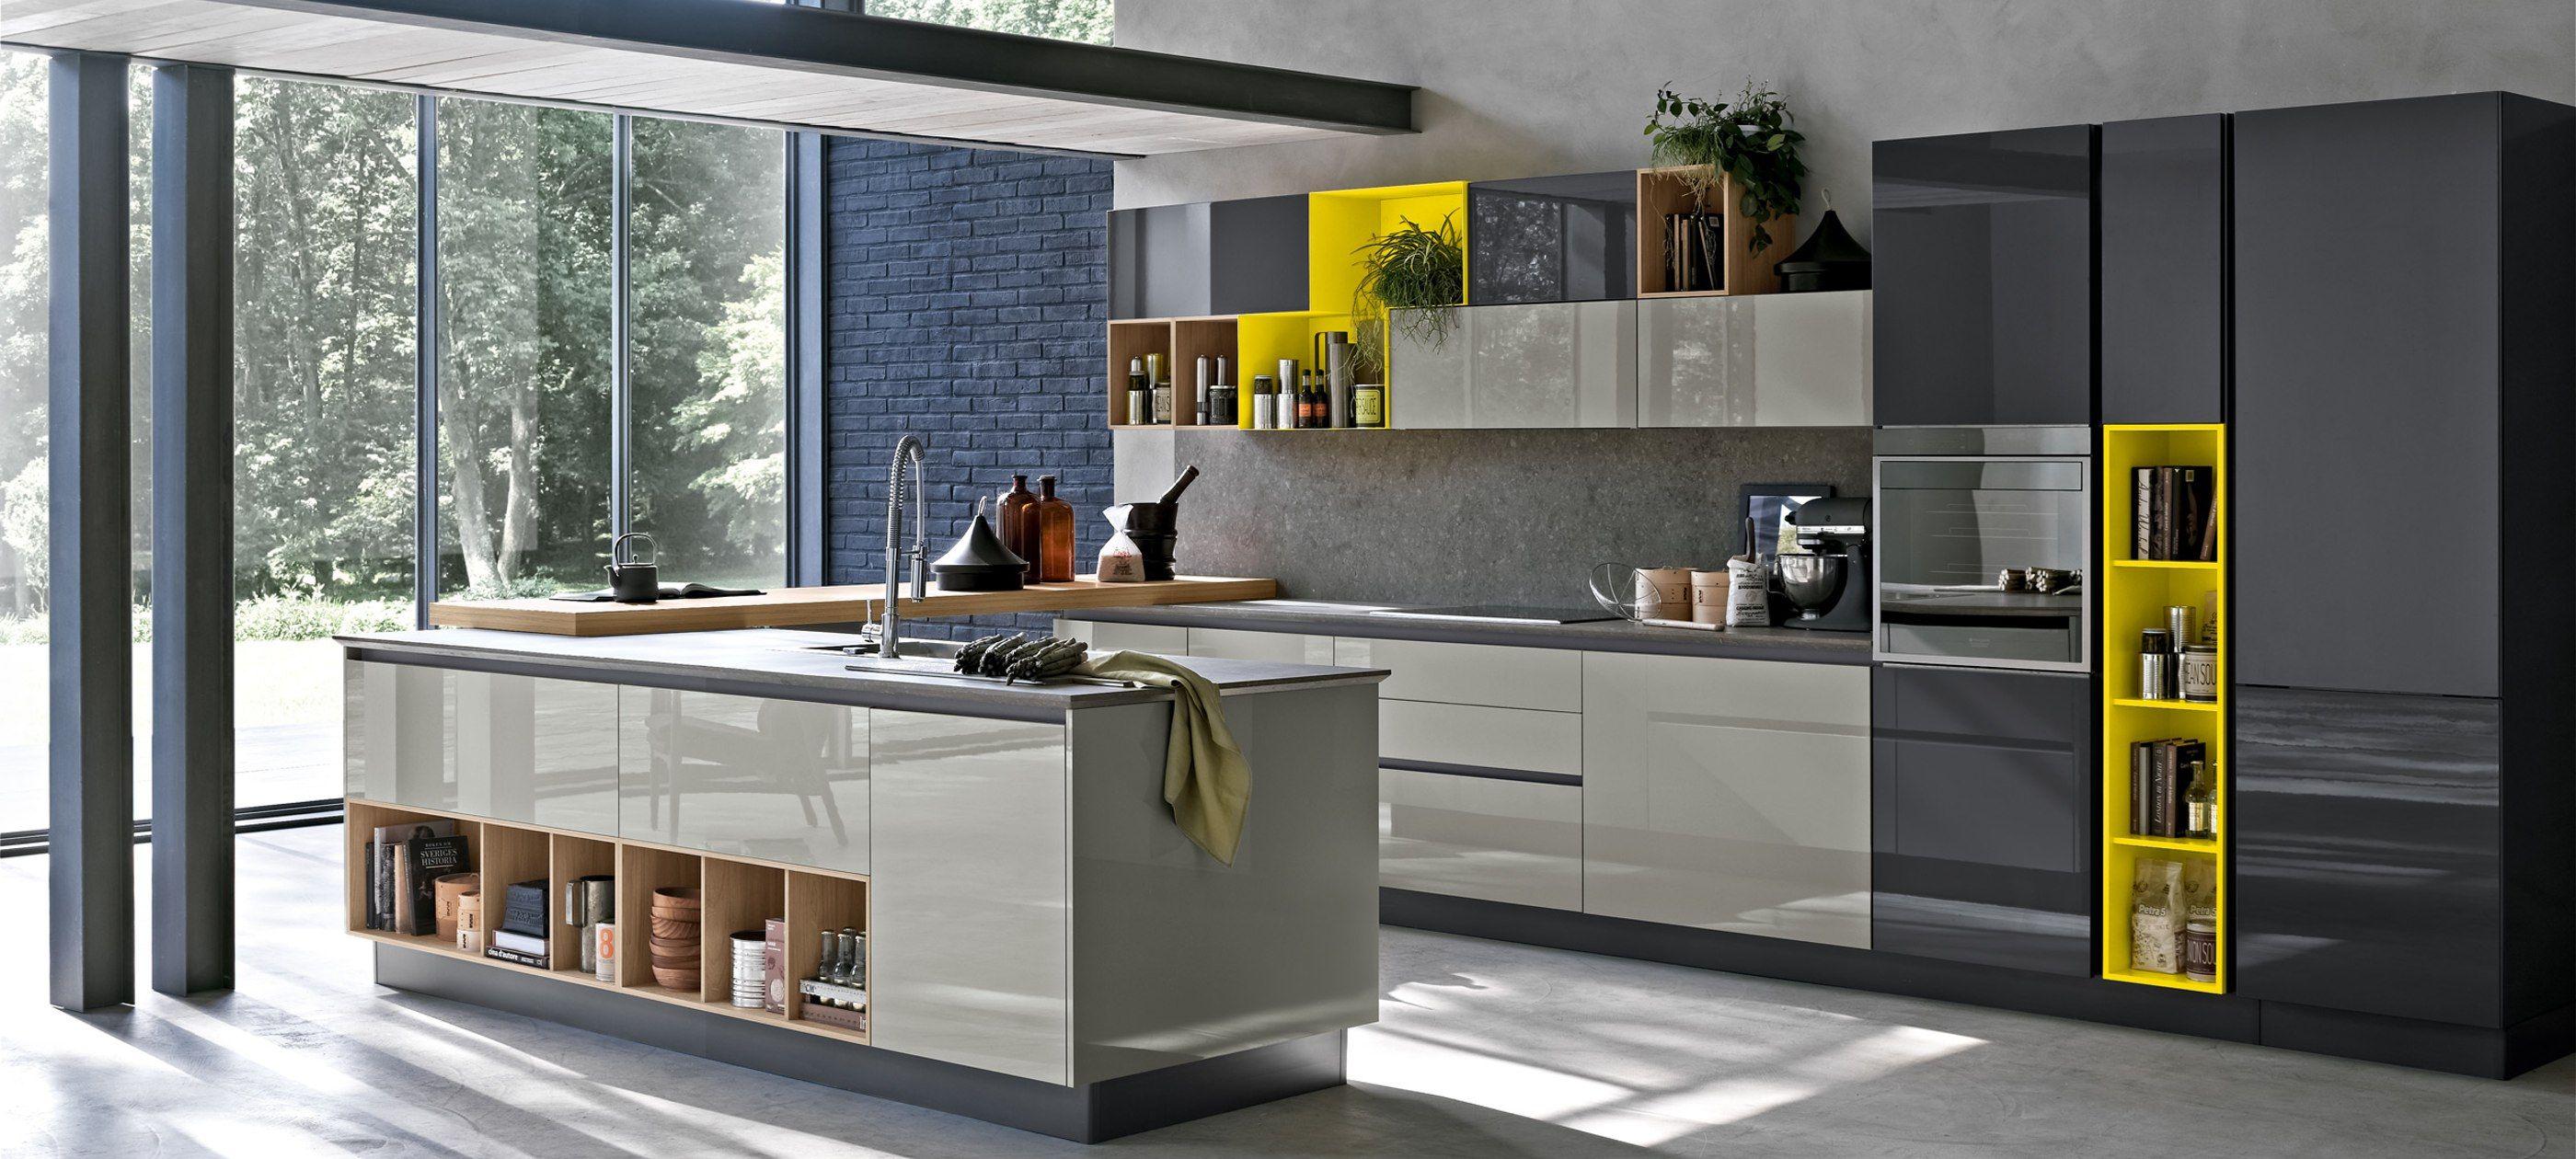 Cucine Moderne Stosa.Cucine Moderne Stosa Modello Cucina Aleve 01 Clara